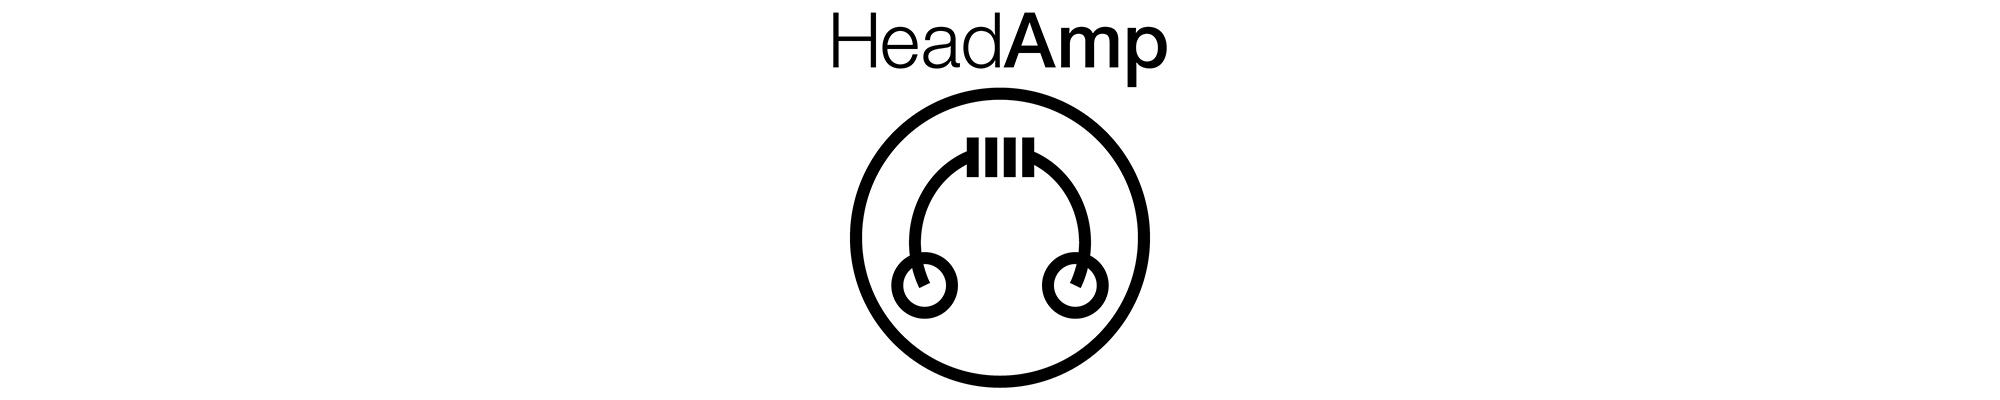 HeadAmp